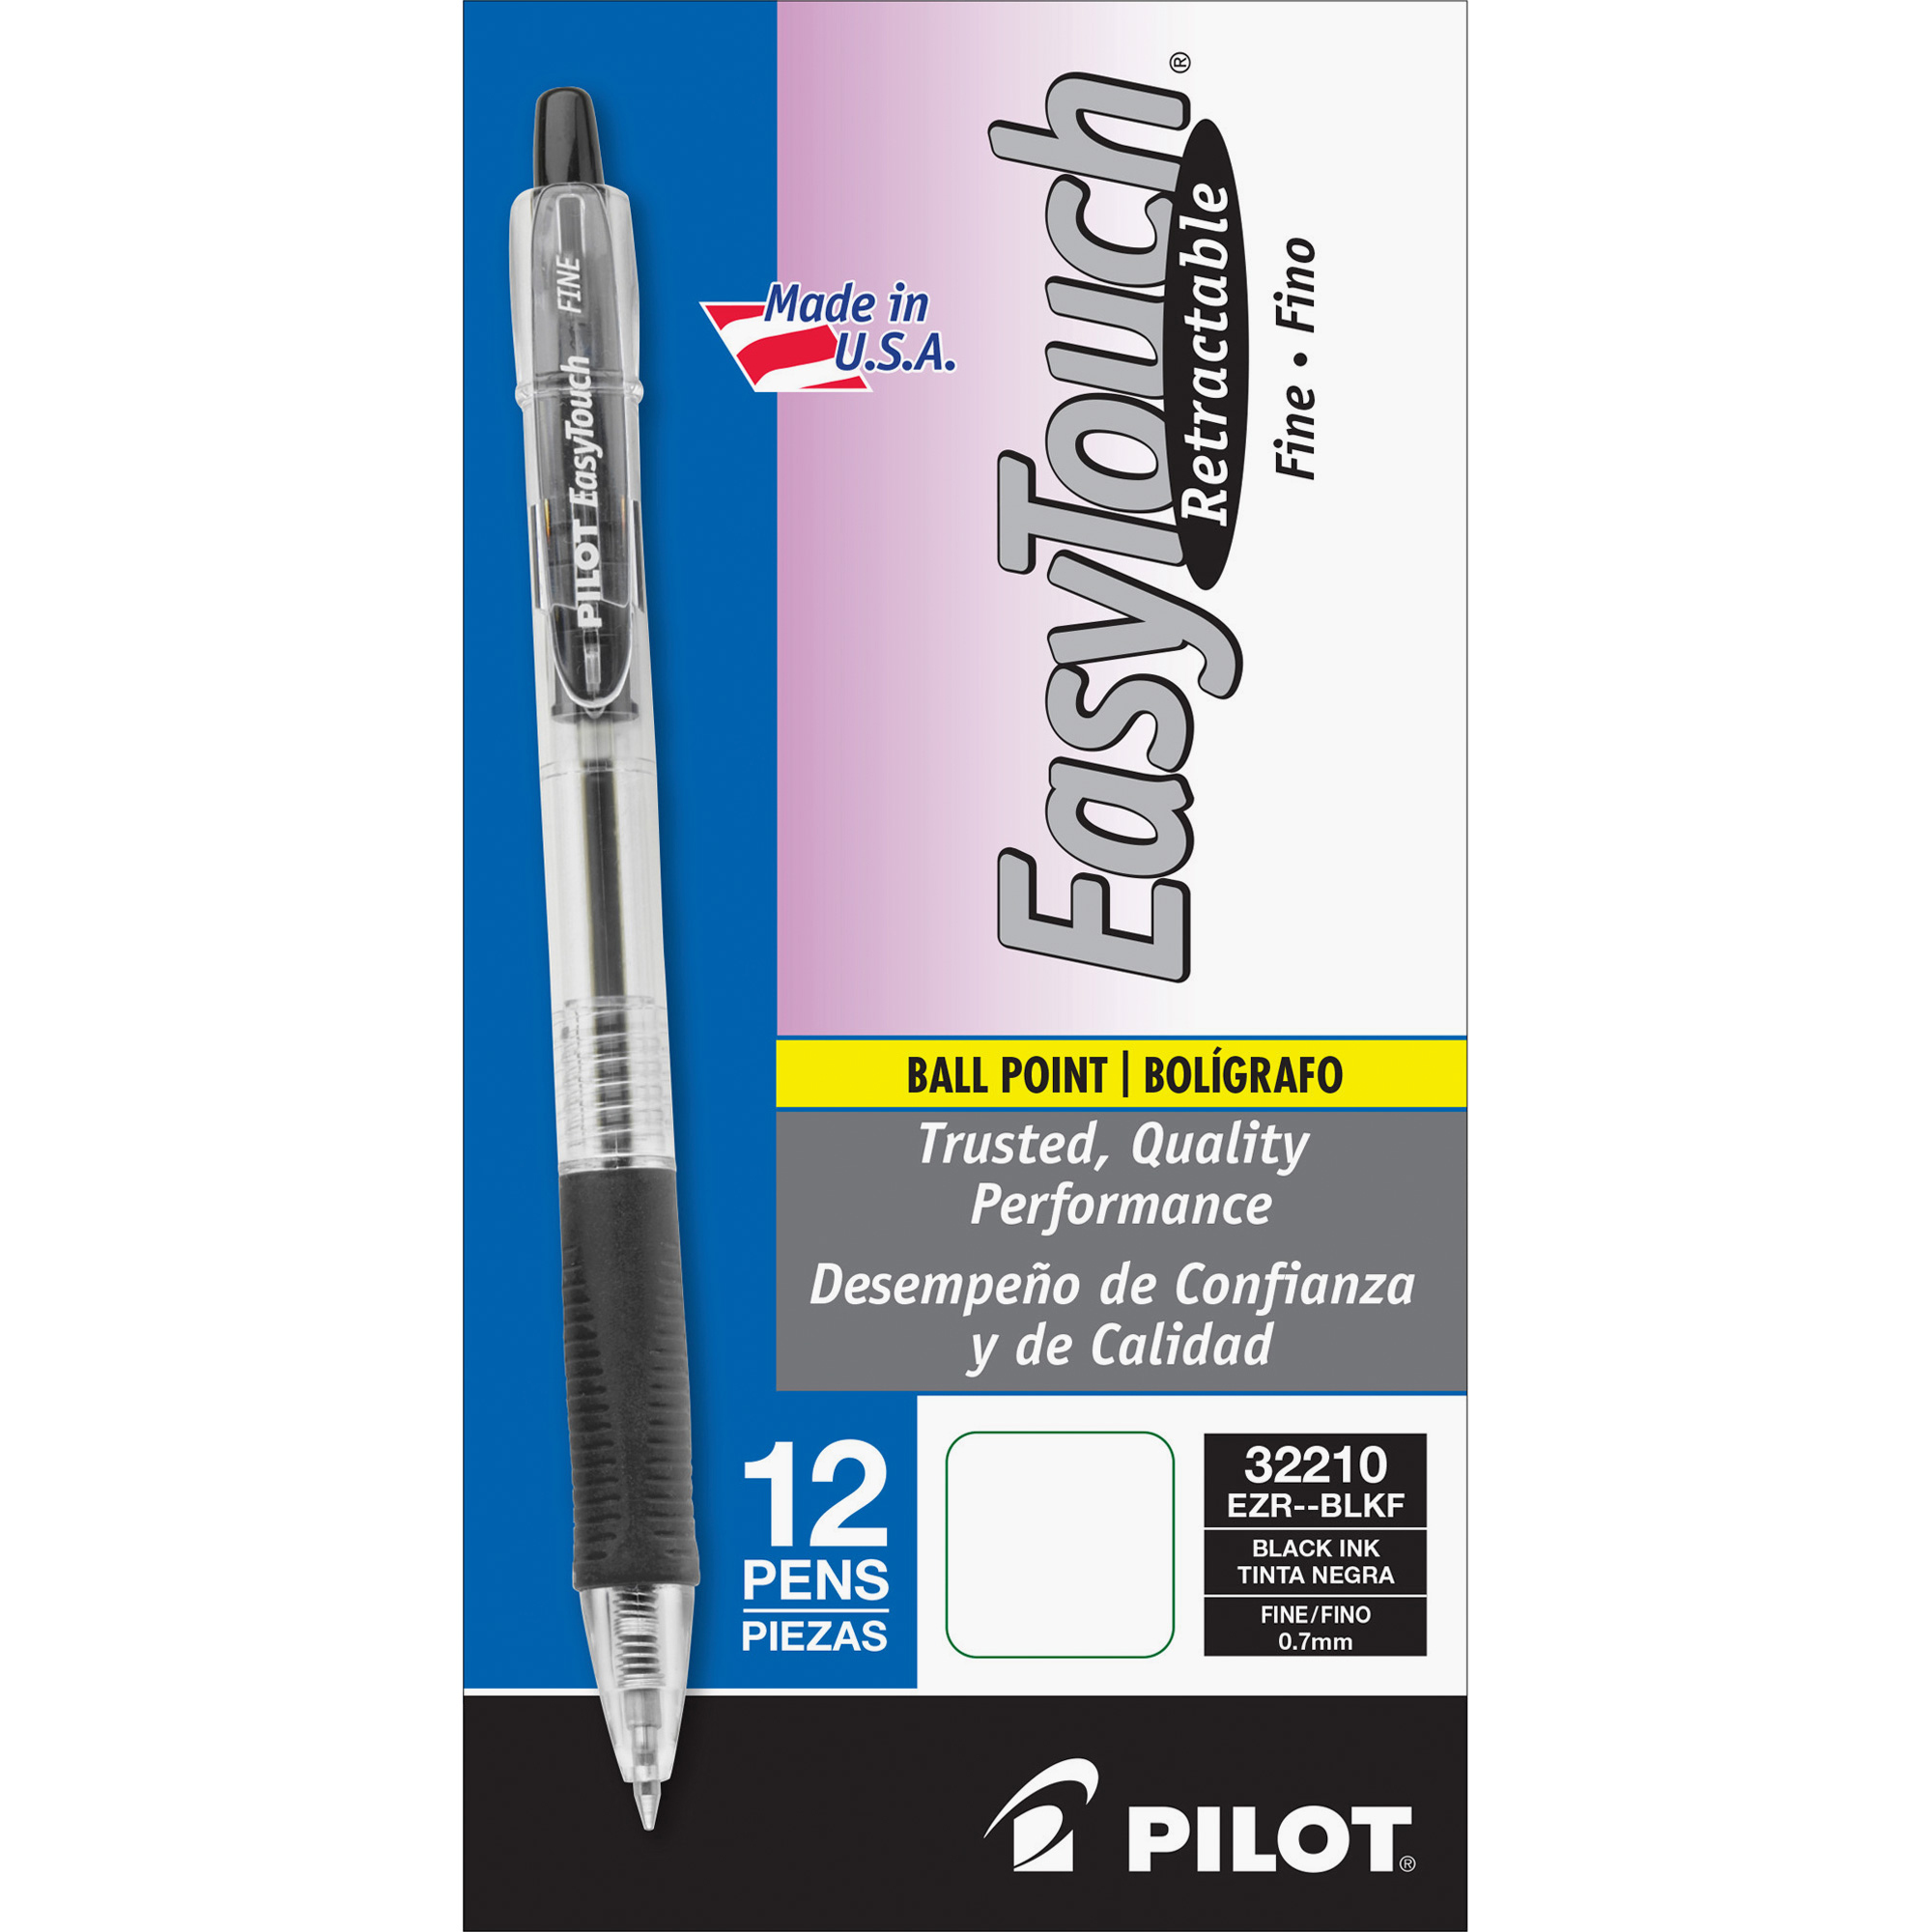 Pilot EasyTouch Retractable Ballpoint Pen